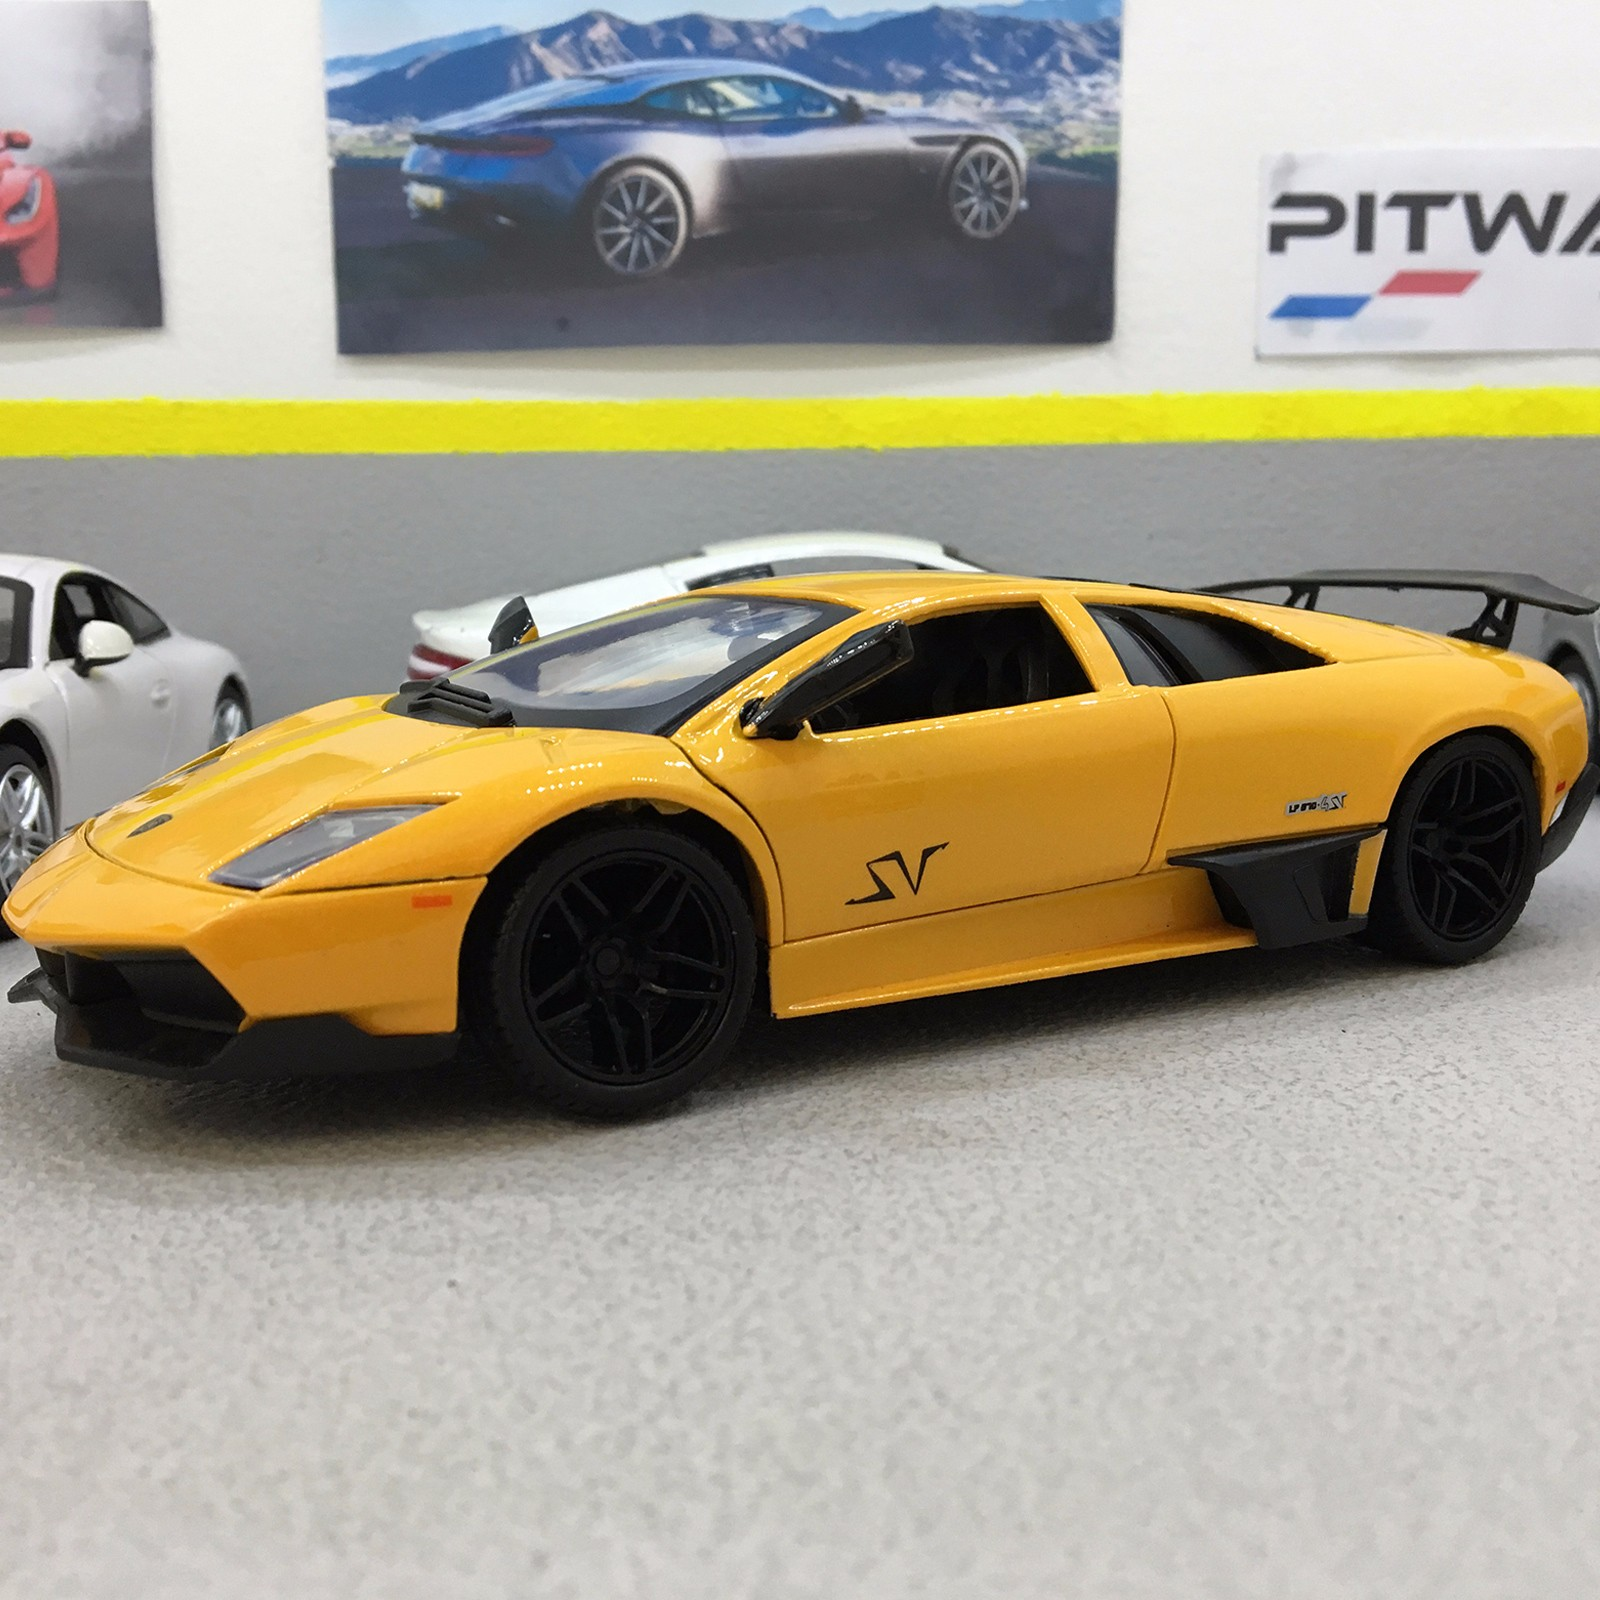 Lamborghini Murcielago Lp 670 4 Sv Yellow 1 24 Scale Die Cast Model